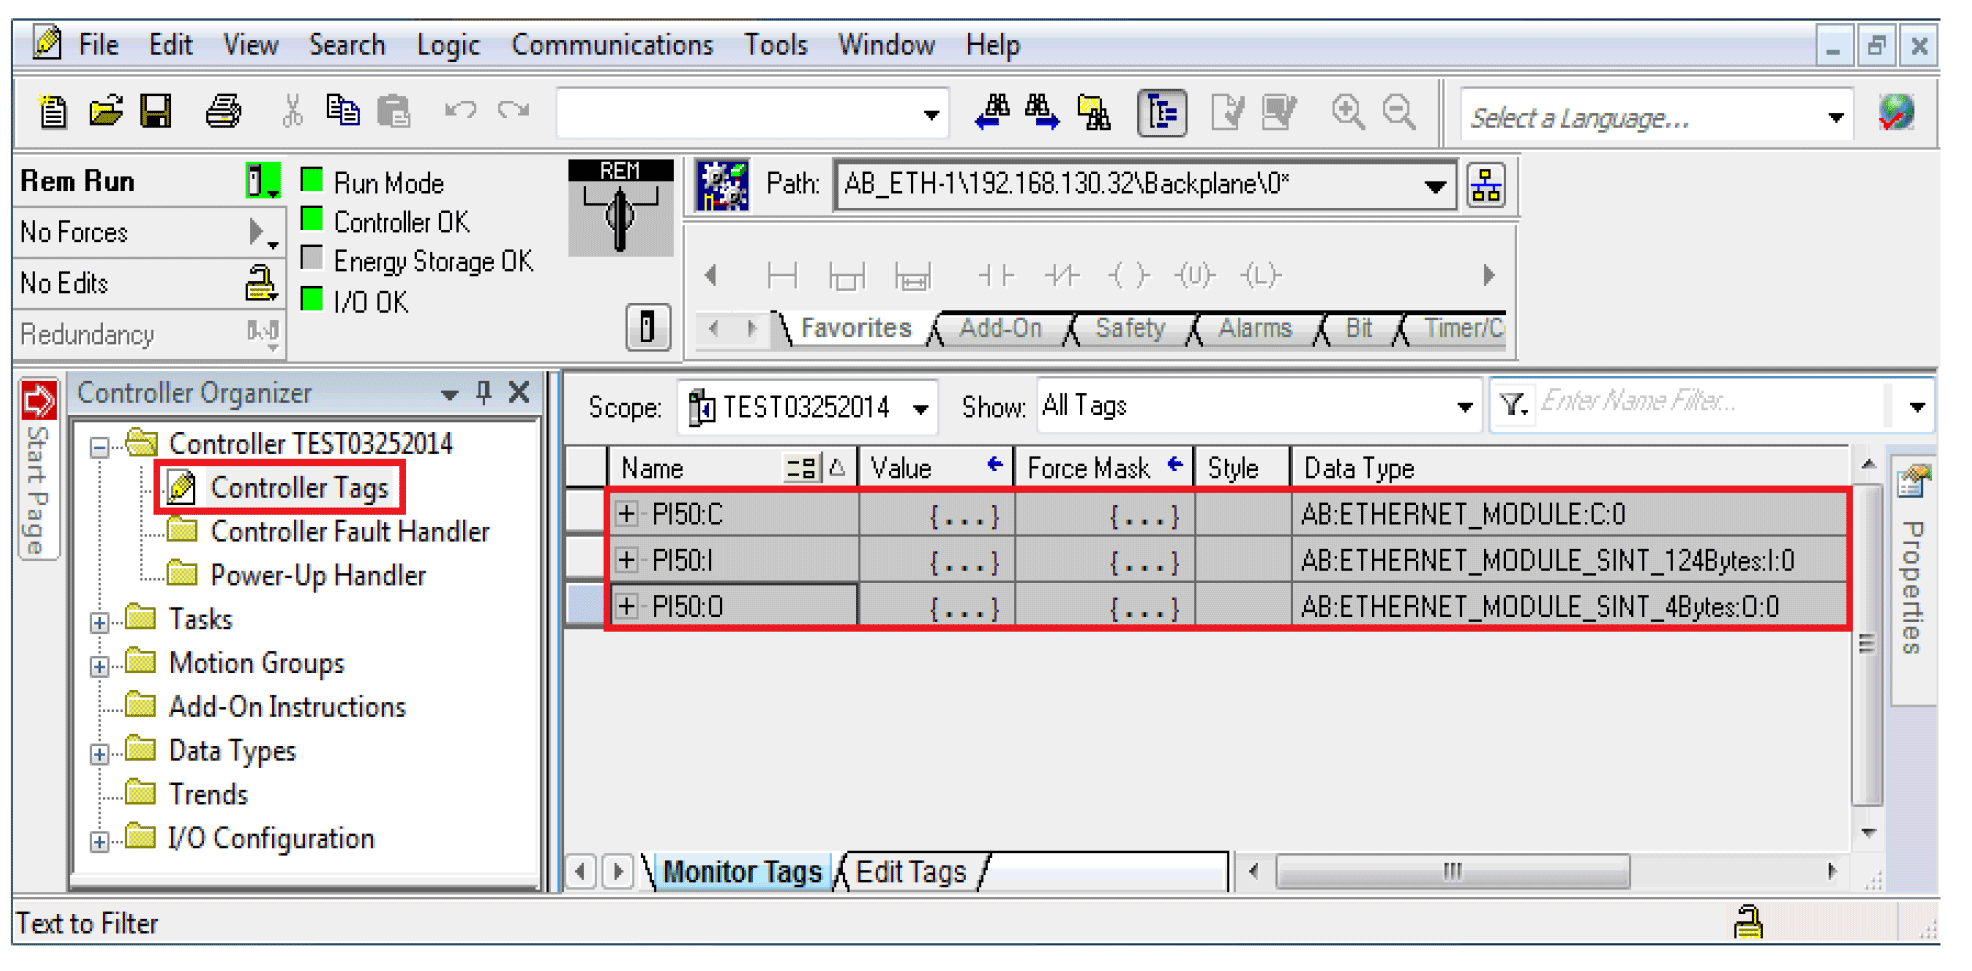 Easily Obtain Vision Sensor Data Over EitherNetIP